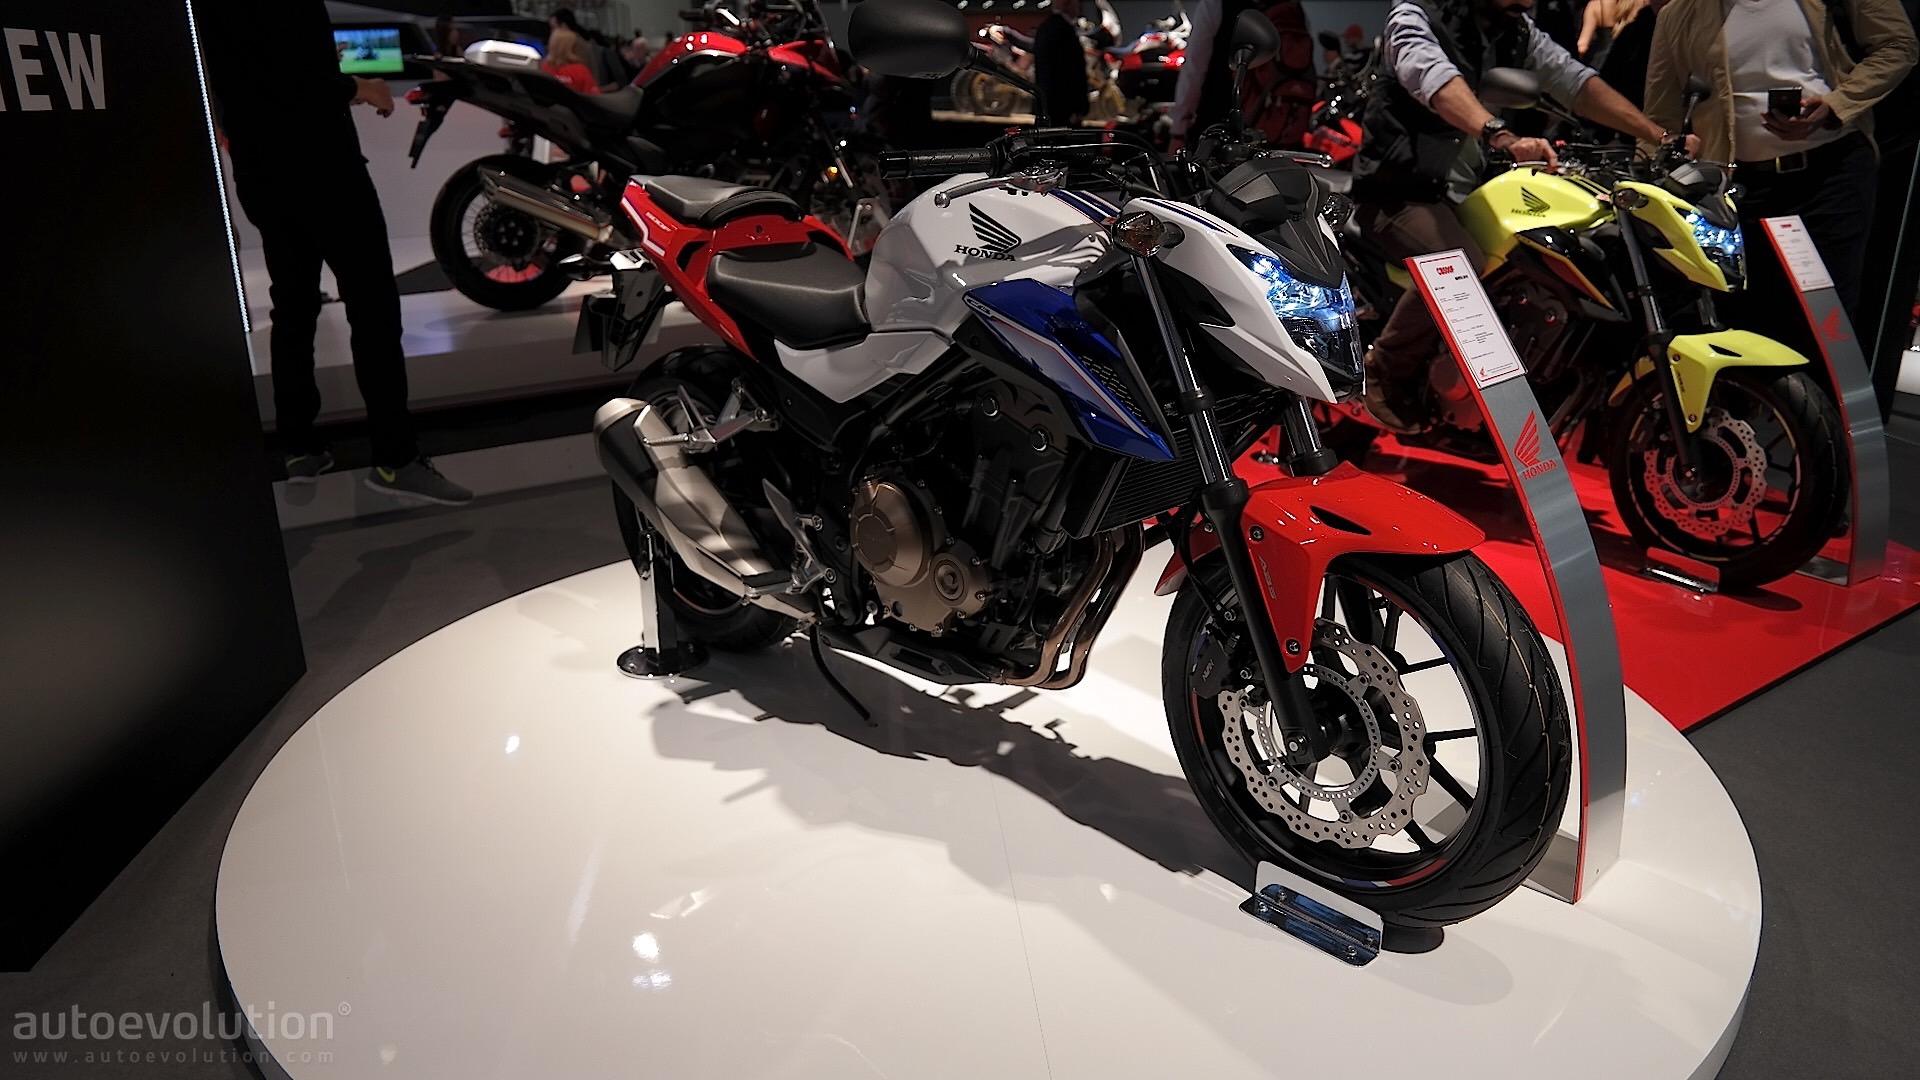 EICMA 2016 Honda CB500F Introduces A Short List Of Upgrades